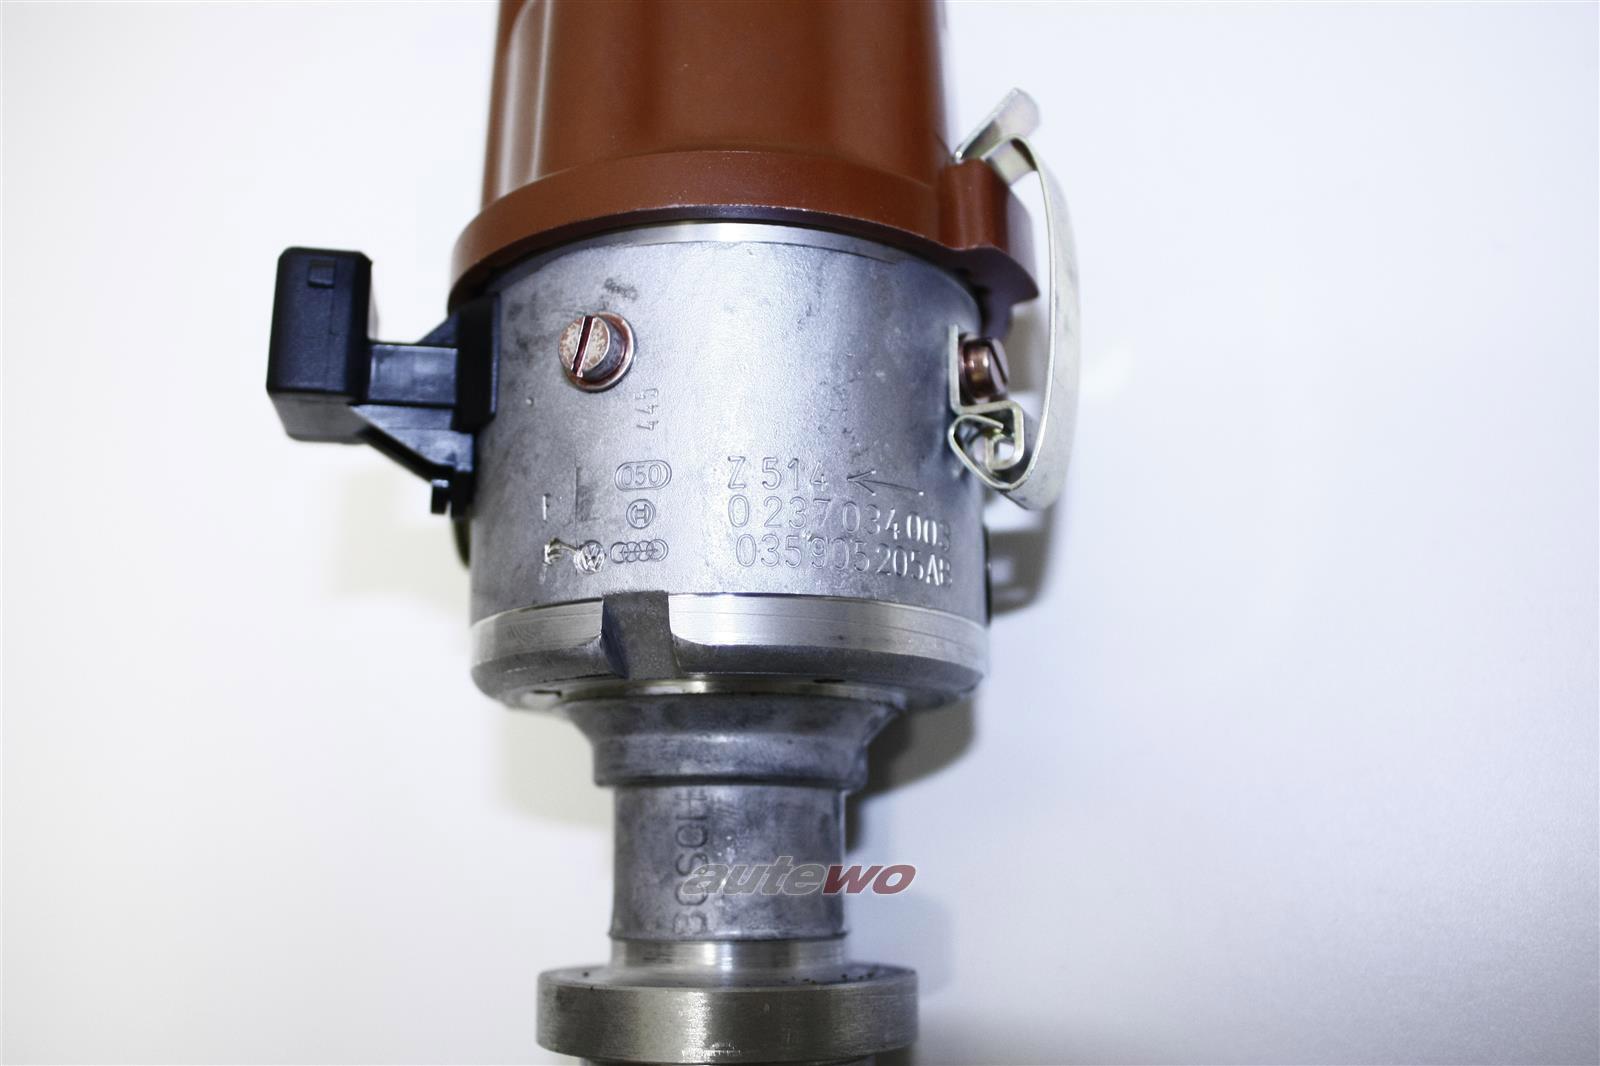 035905205AB 0237034003 NEU Audi 100/200 Typ 44 2.2l 5 Zyl. WC Zündverteiler